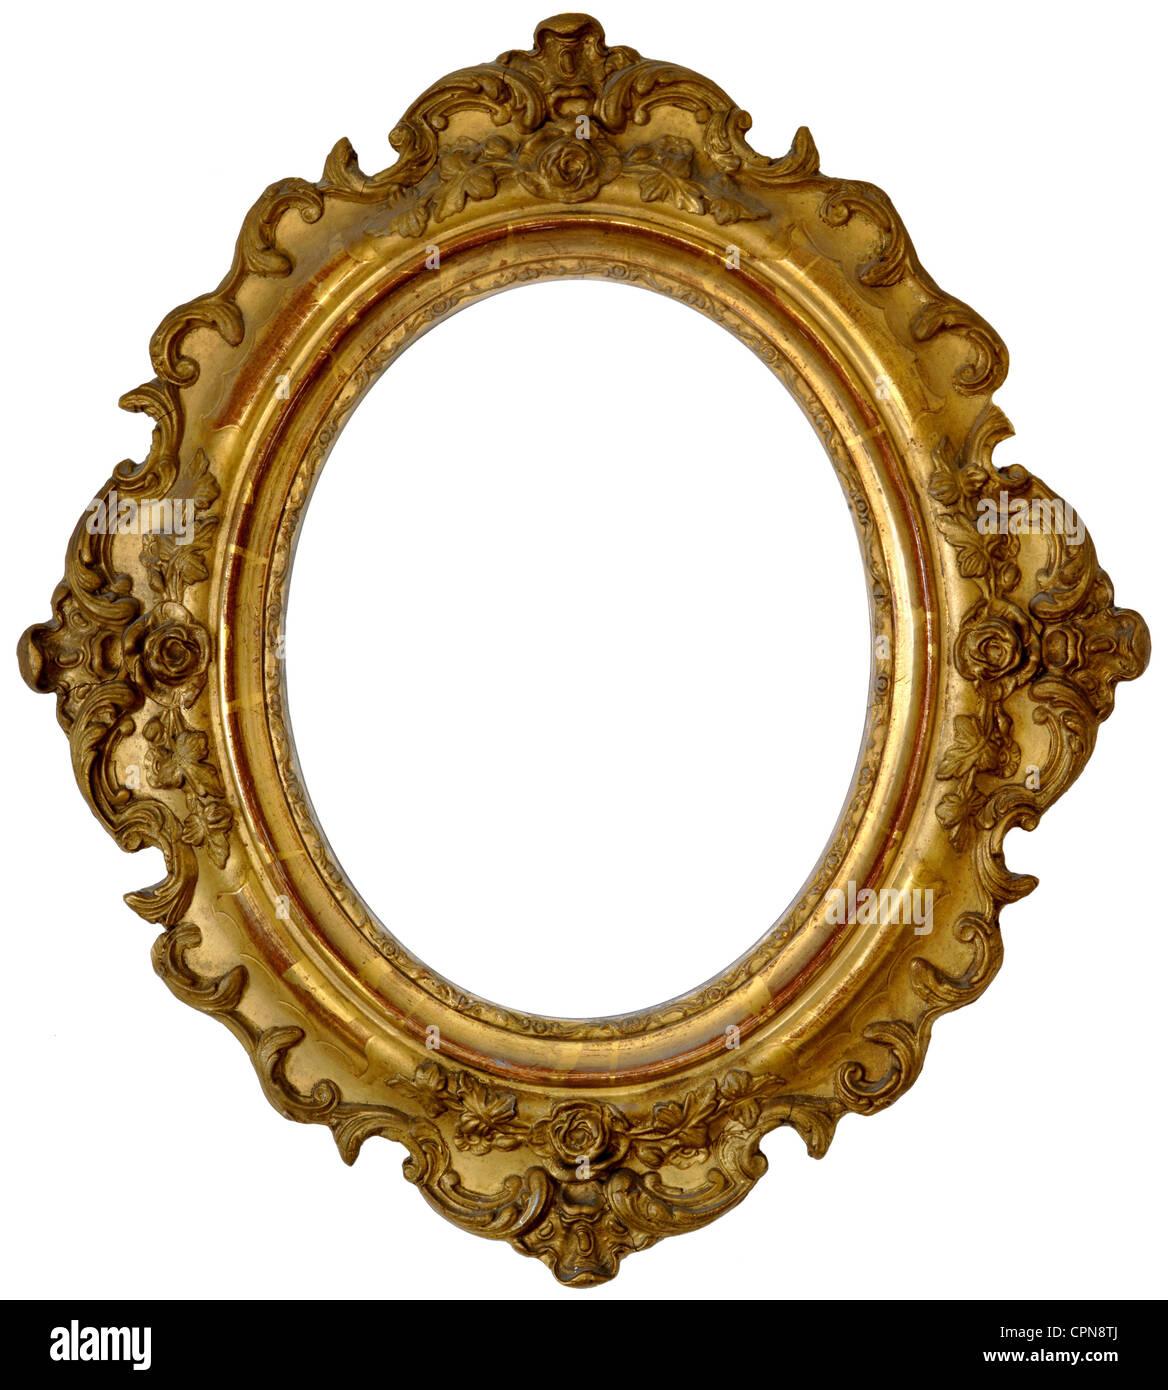 Fine arts picture frame golden picture frame oval wooden frame fine arts picture frame golden picture frame oval wooden frame gold plated germany circa 1835 biedermeier style bieder jeuxipadfo Gallery